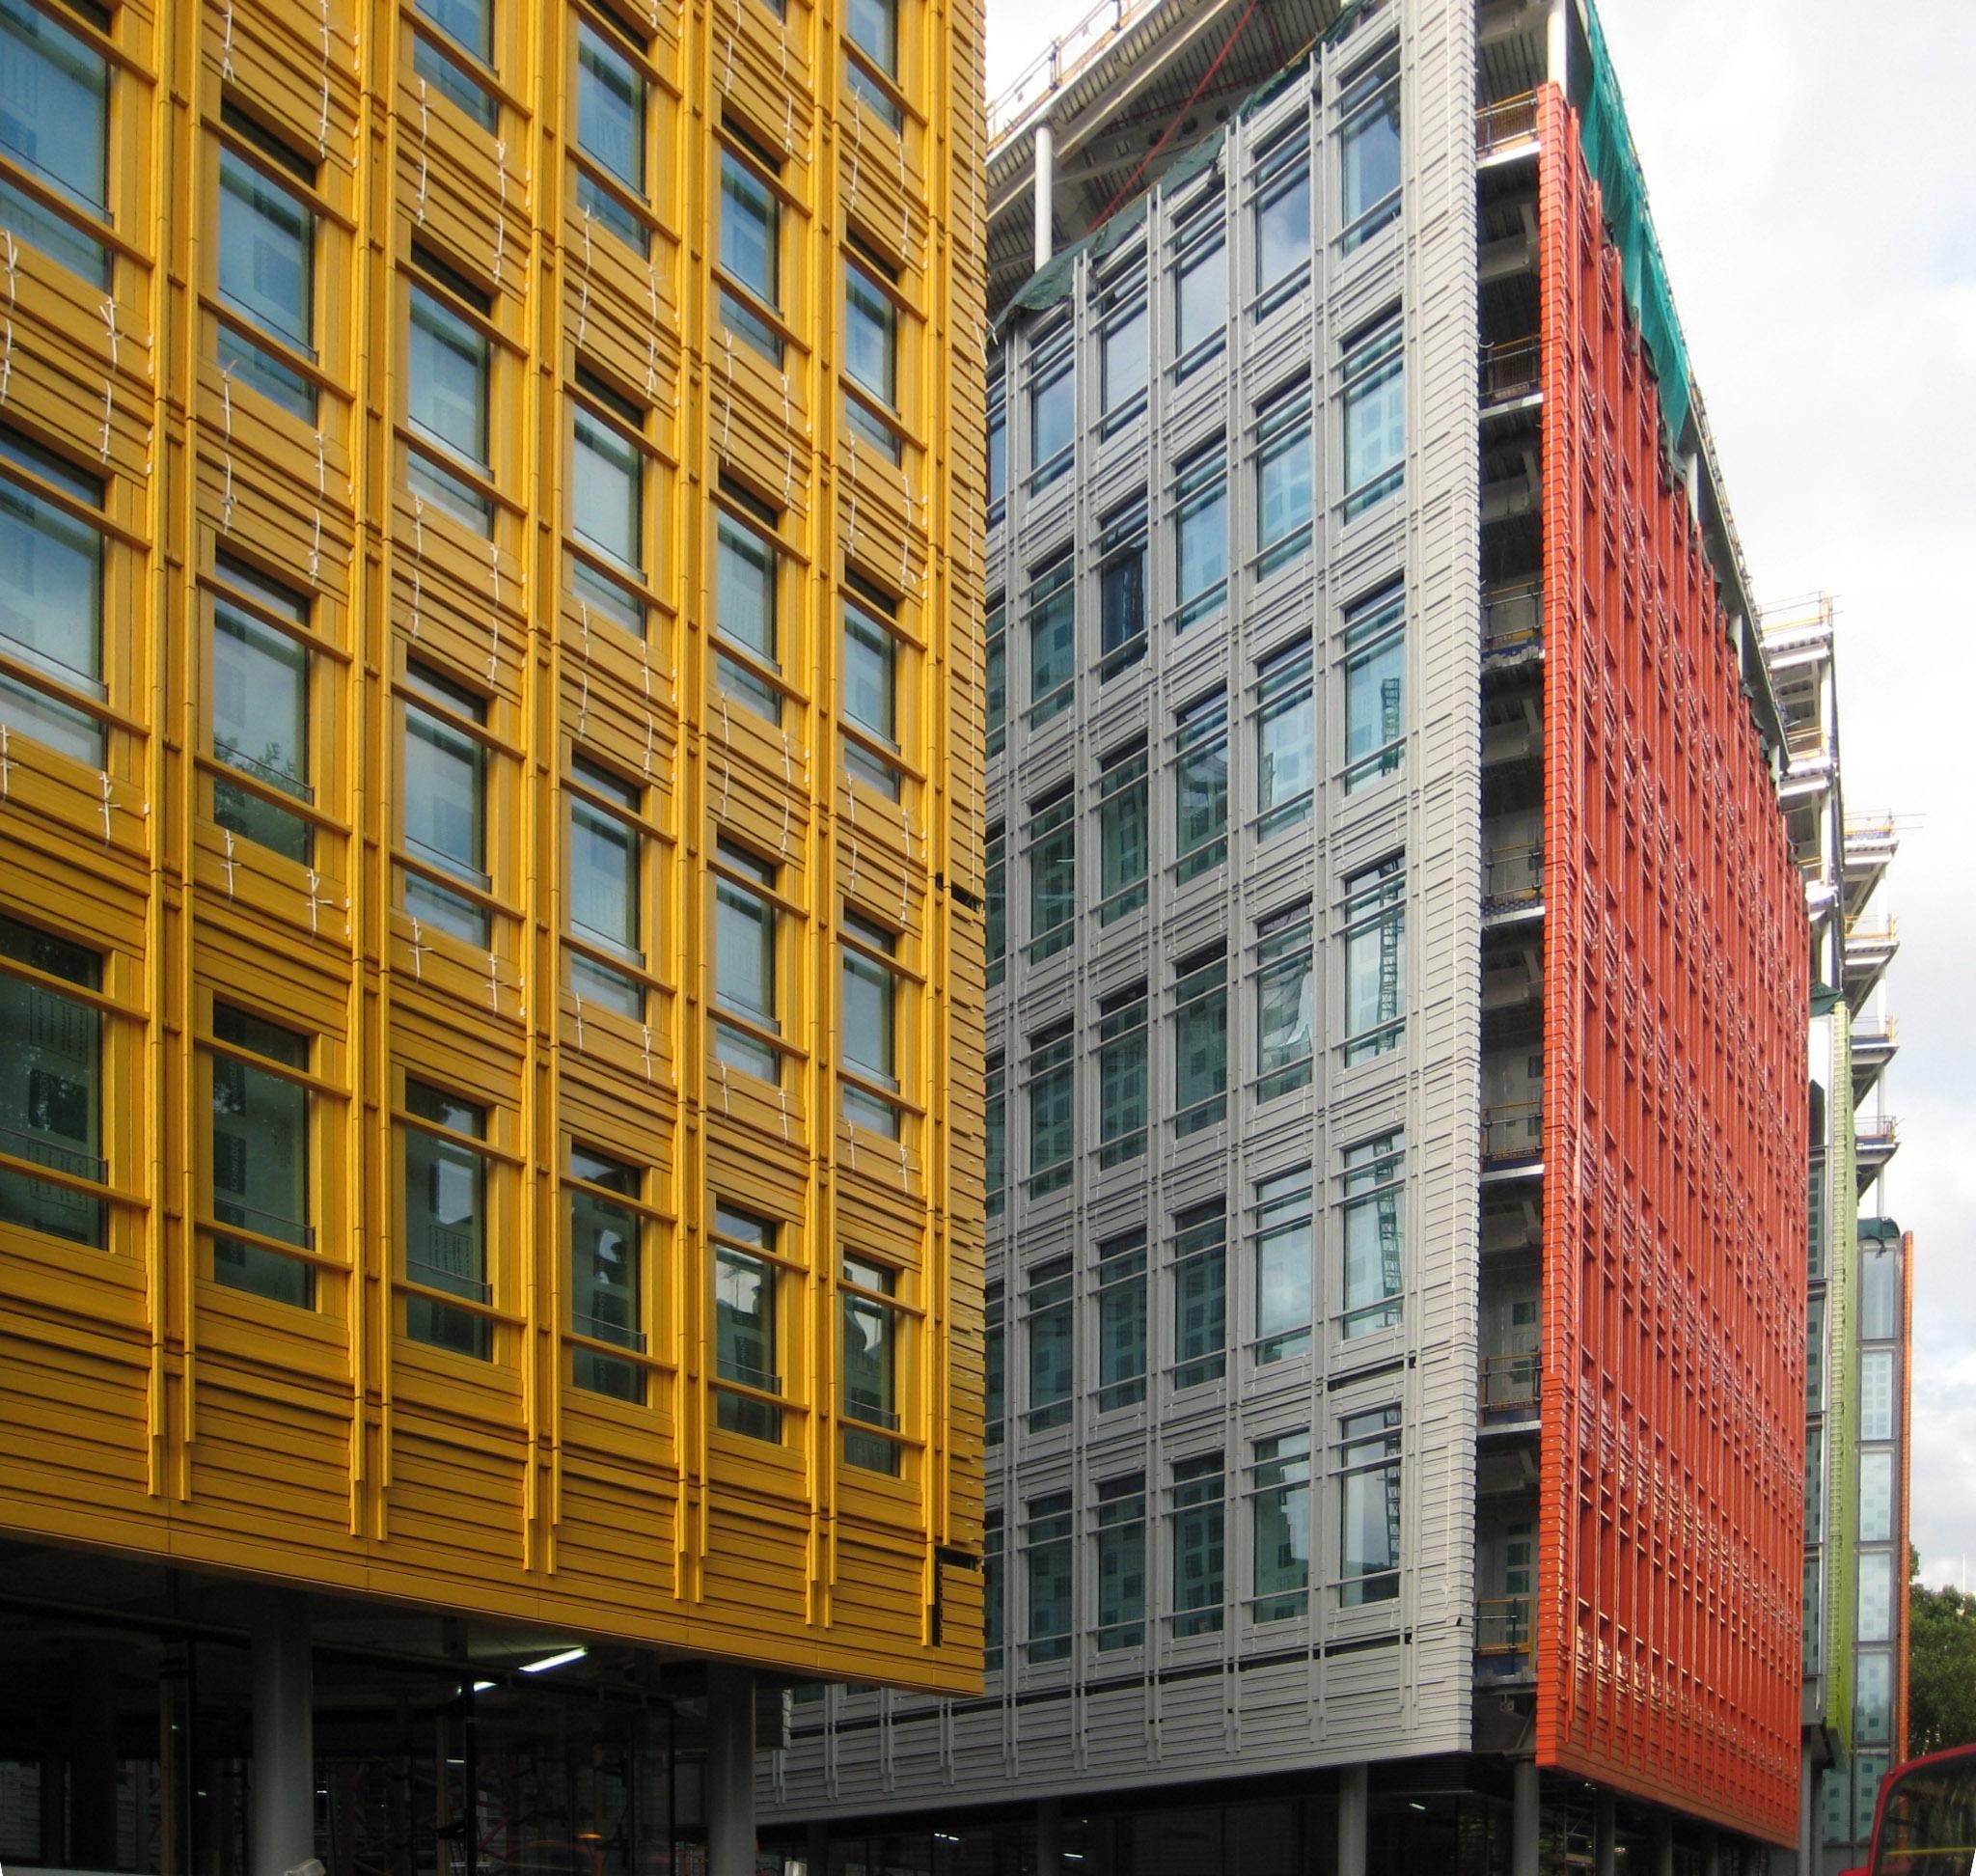 Facade: Unitized Ceramic Facade, By Renzo Piano In London (011